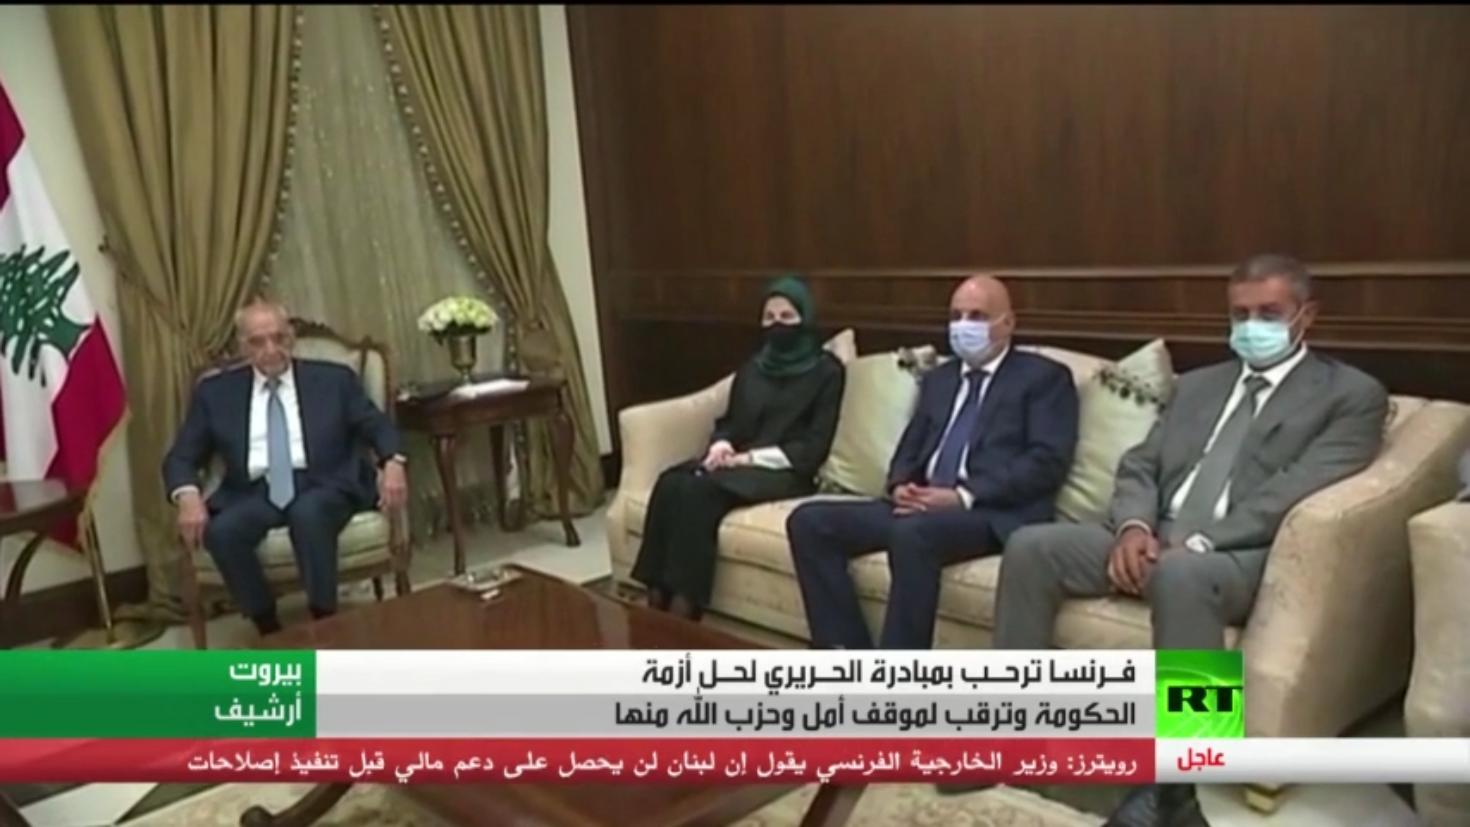 باريس: دعم لبنان مرهون بتنفيذ إصلاحات